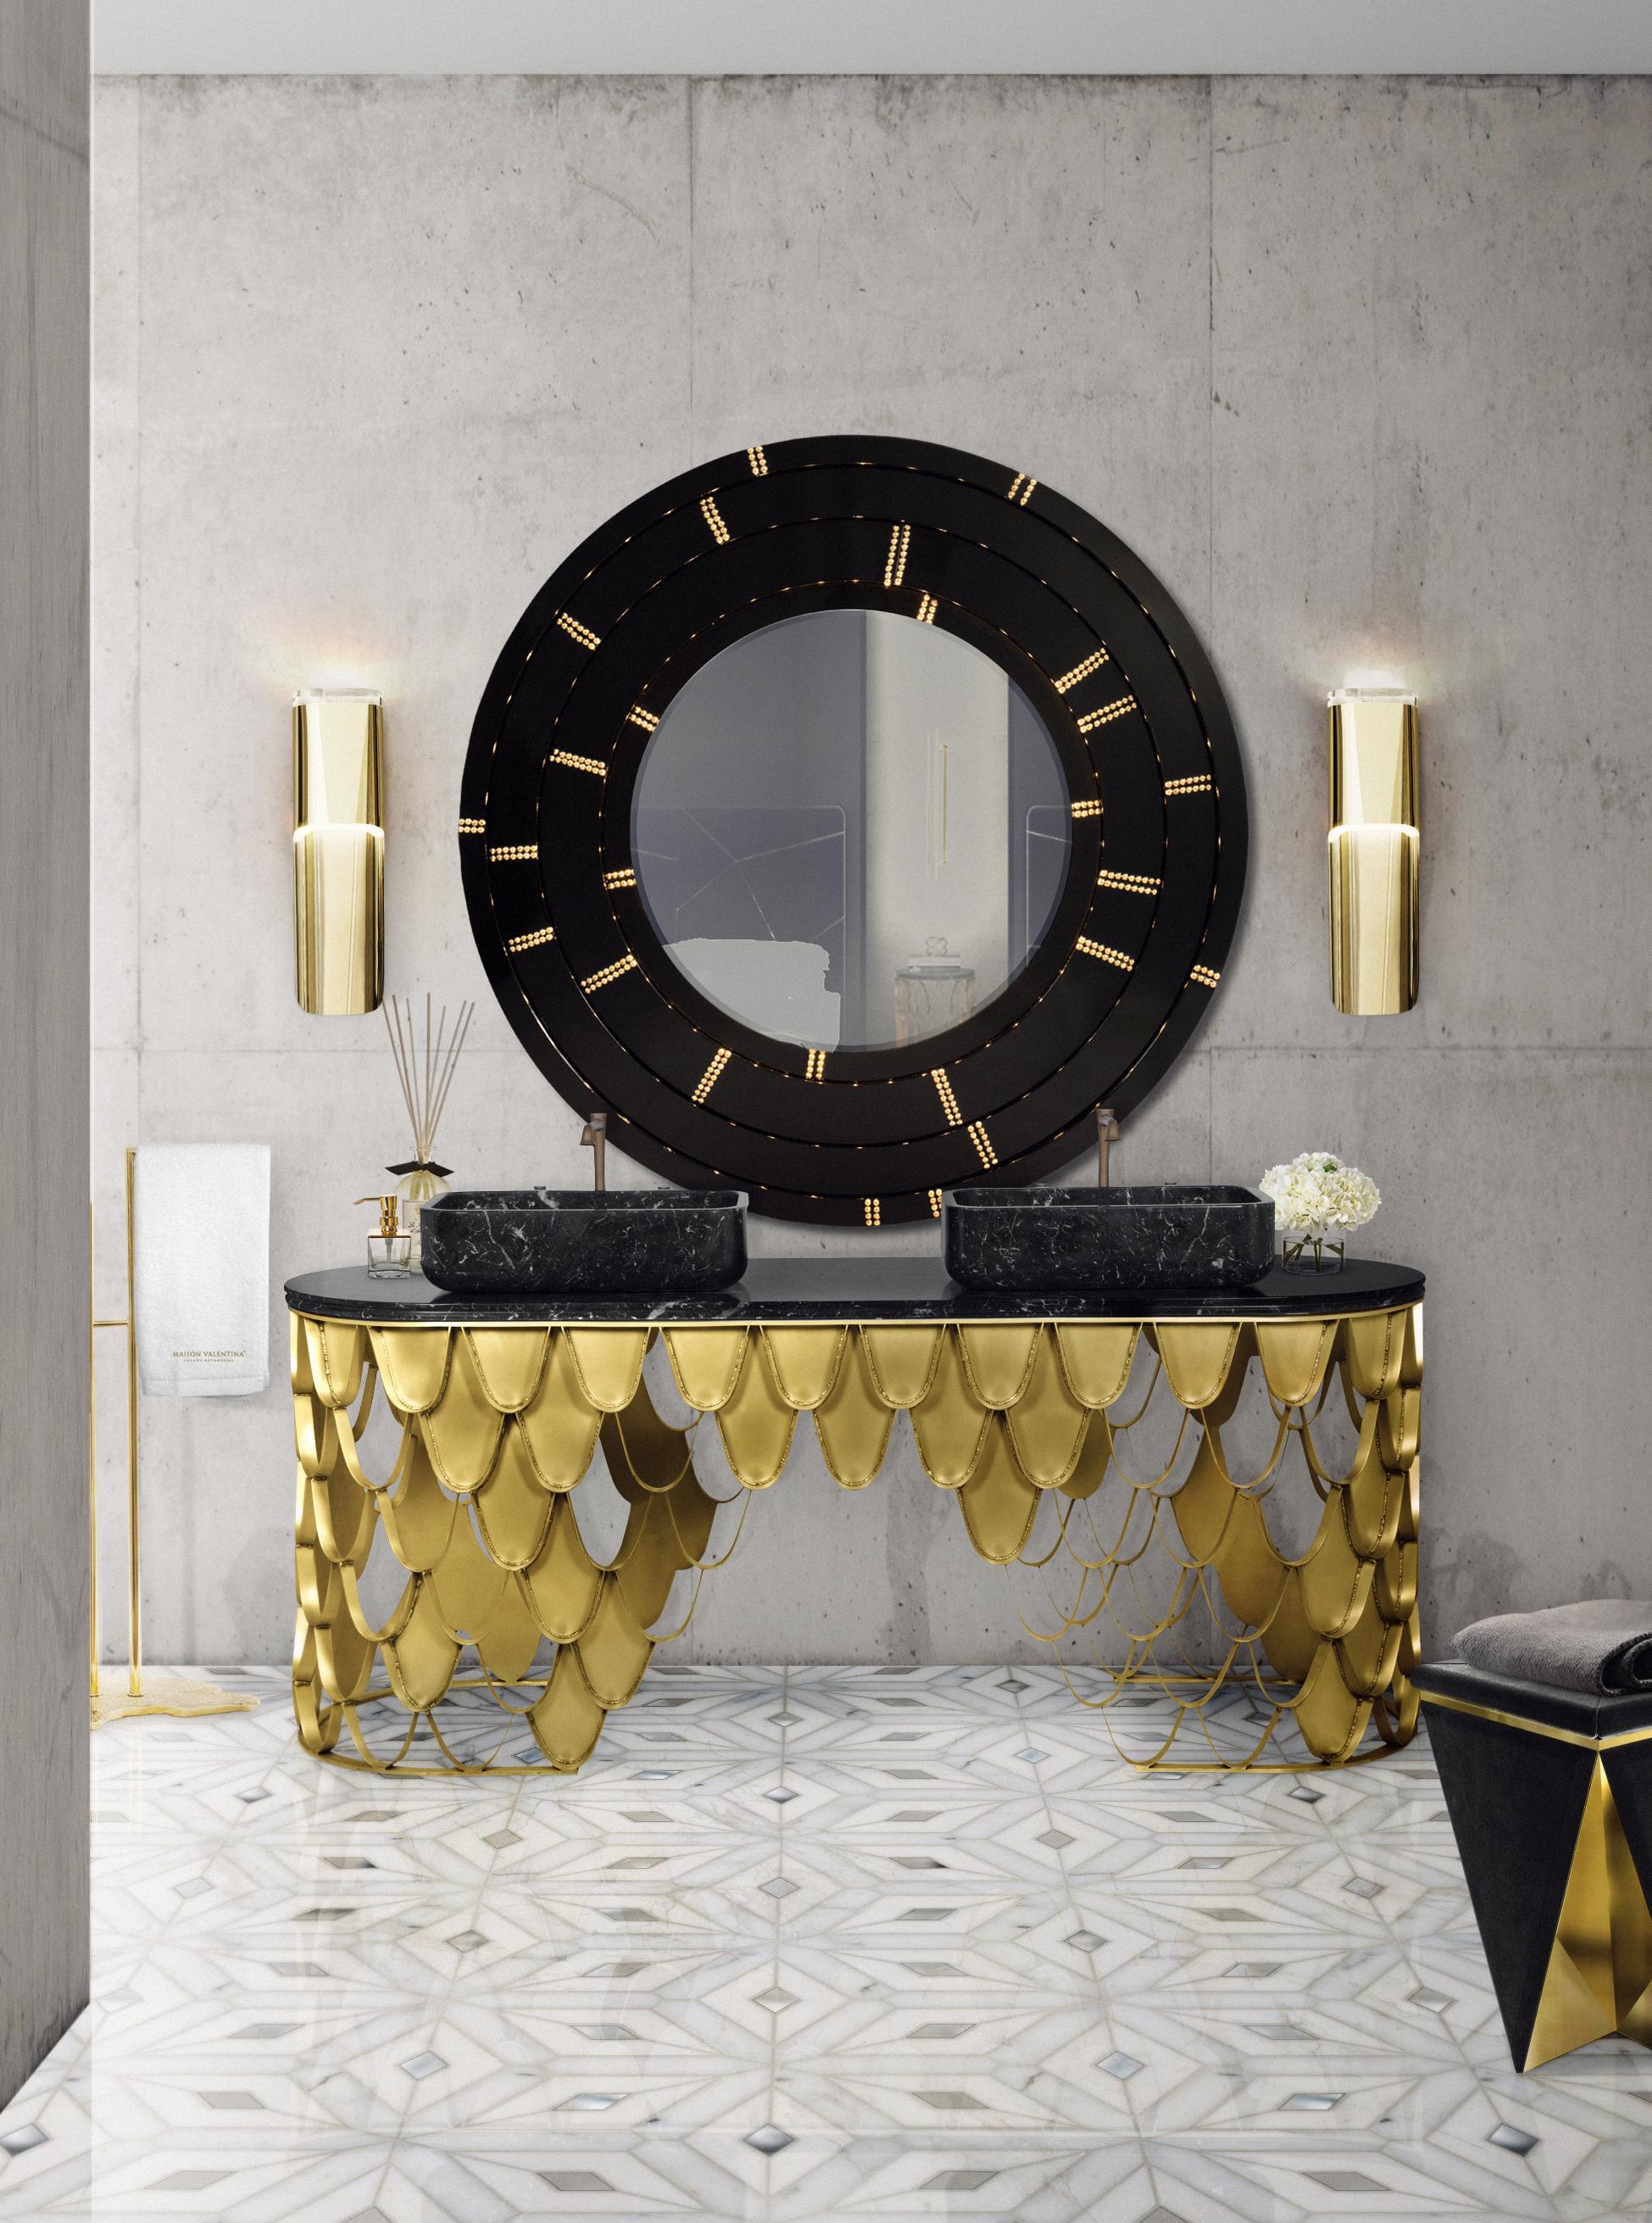 10 Dreaming Luxury Bathrooms For Your Master Bedroom 29 koi washbasin blaze mirror eden towel rack HR